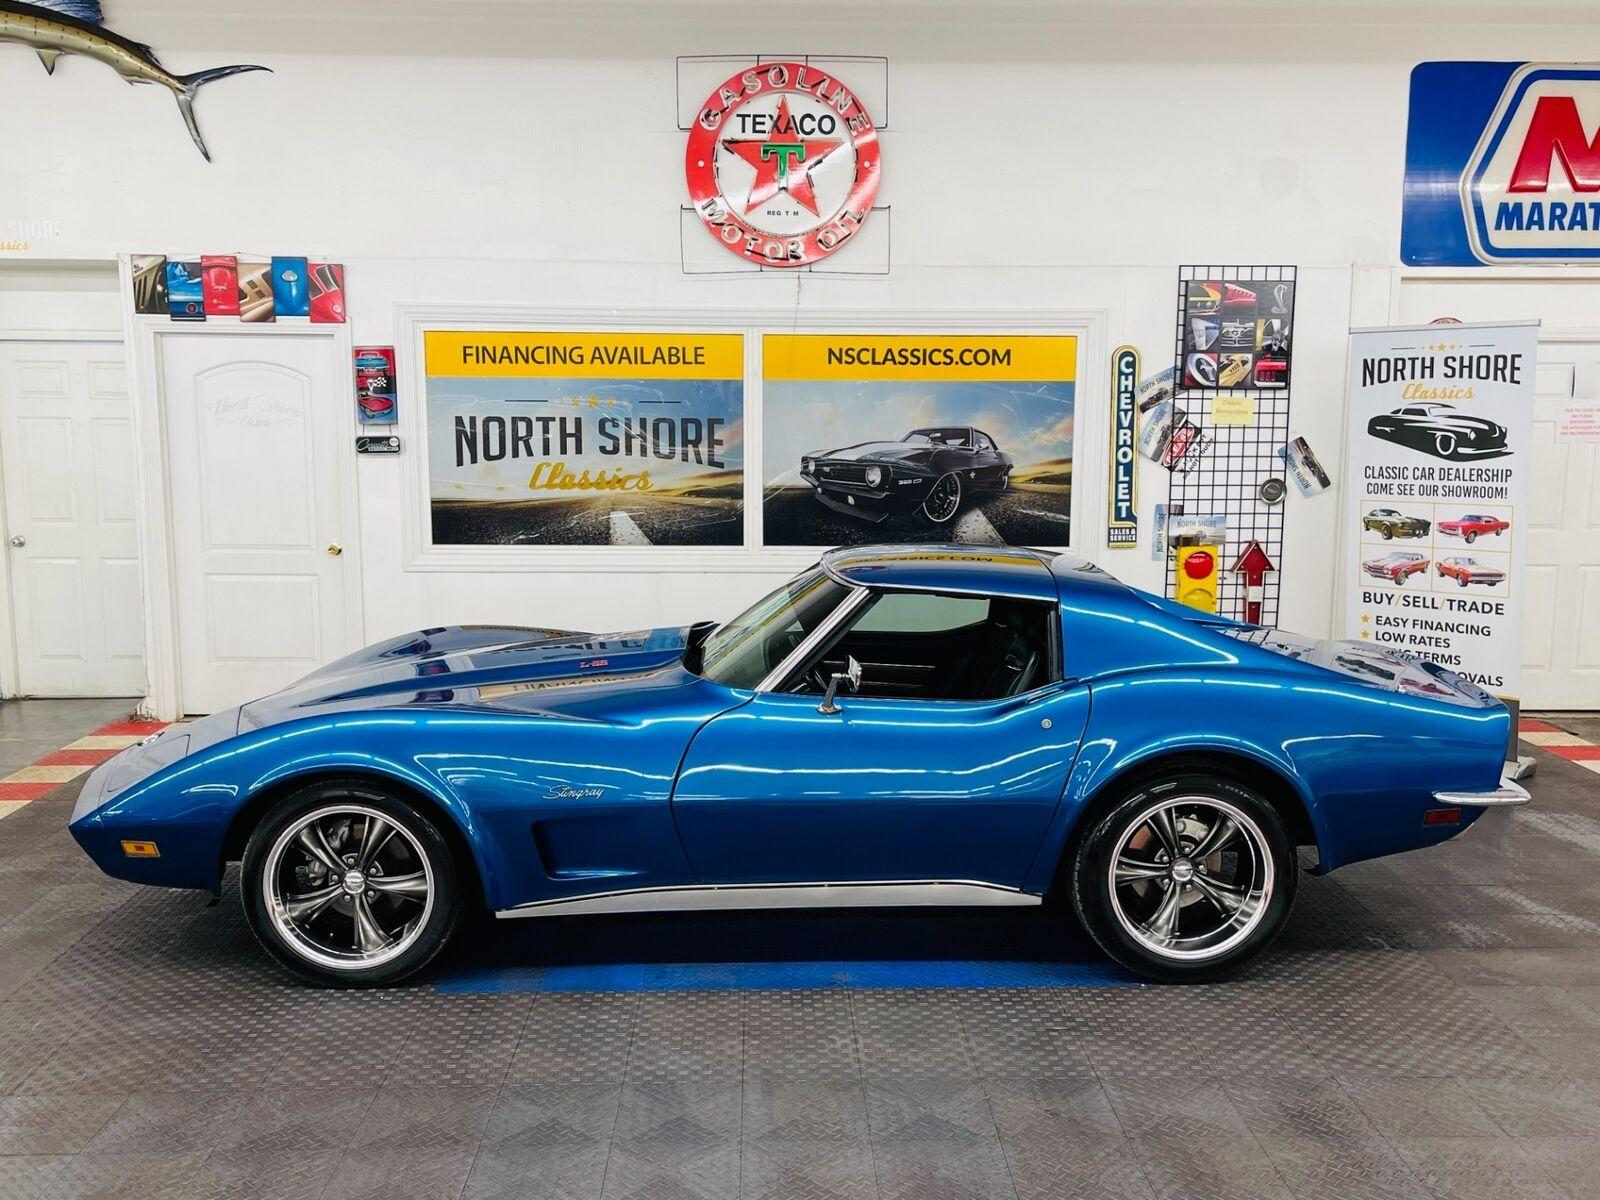 1973 Blue Chevrolet Corvette Coupe  | C3 Corvette Photo 4